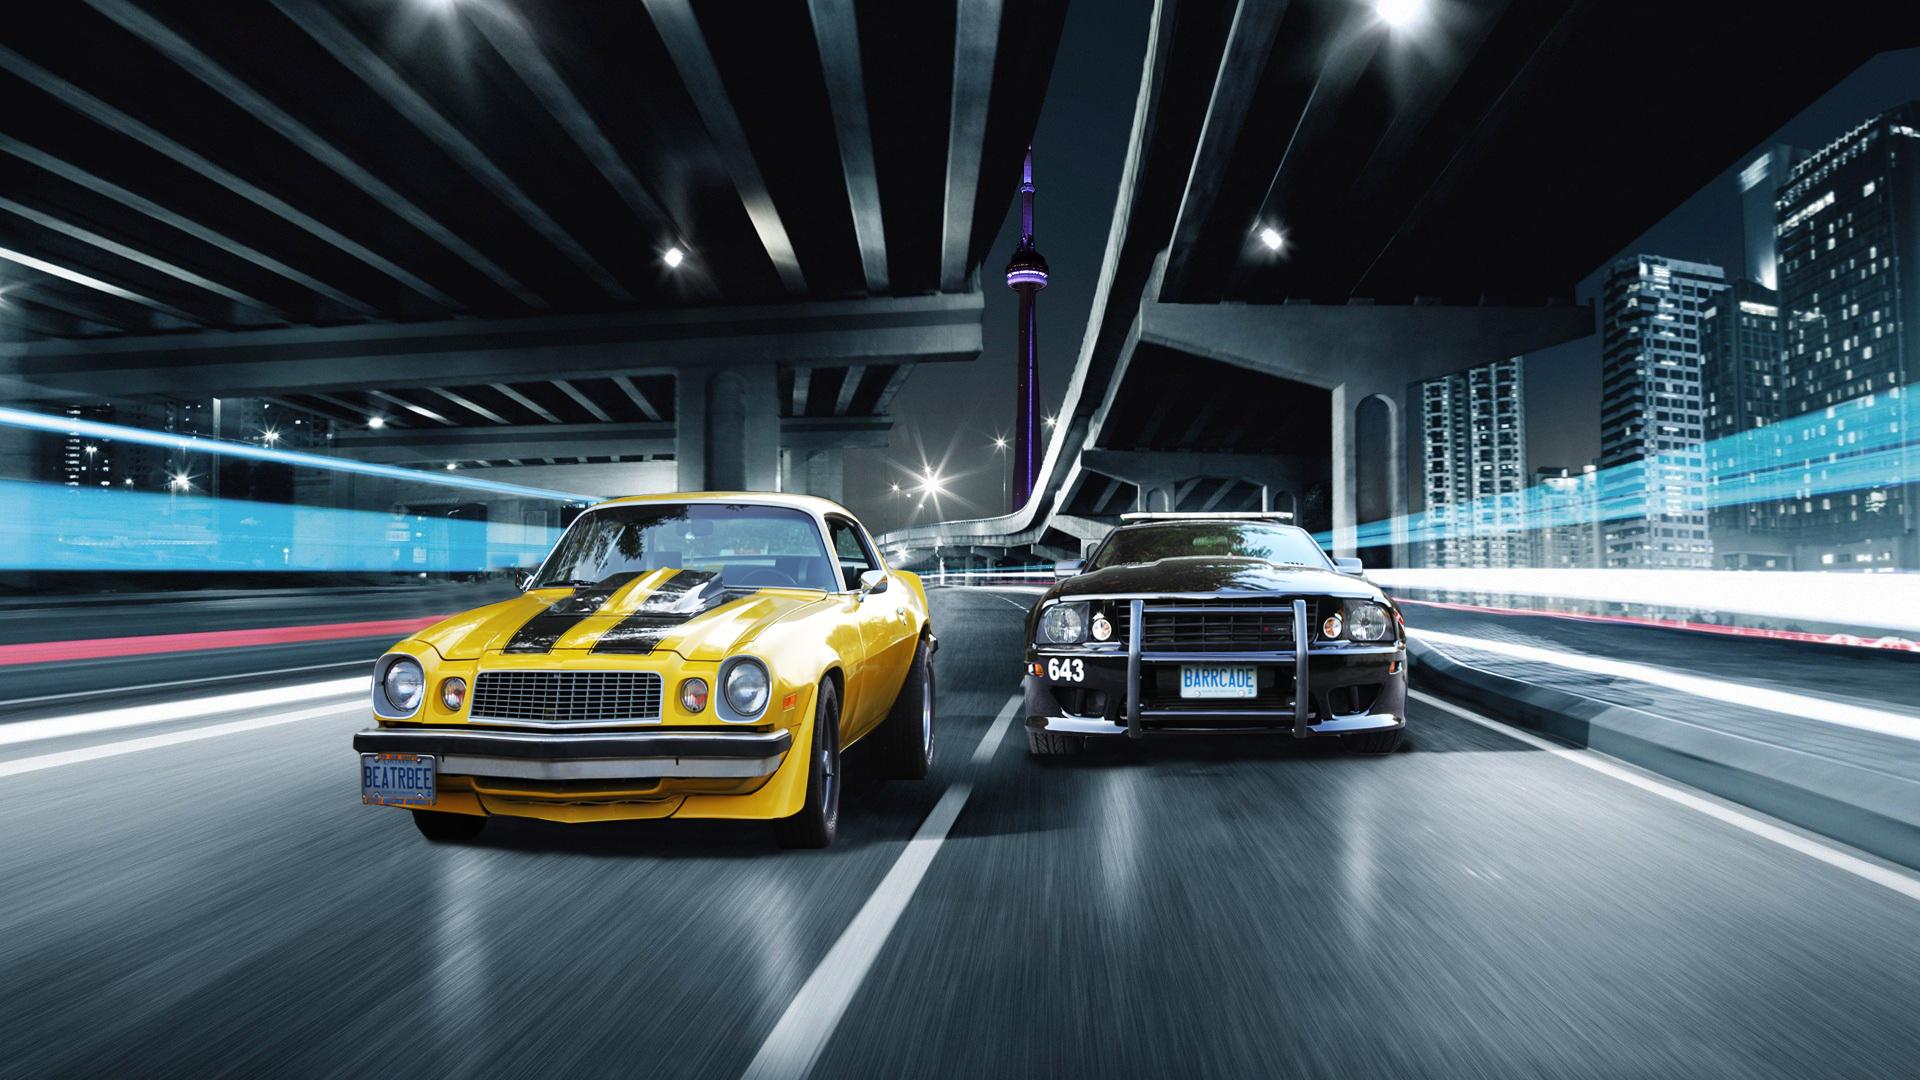 Transformers Cars